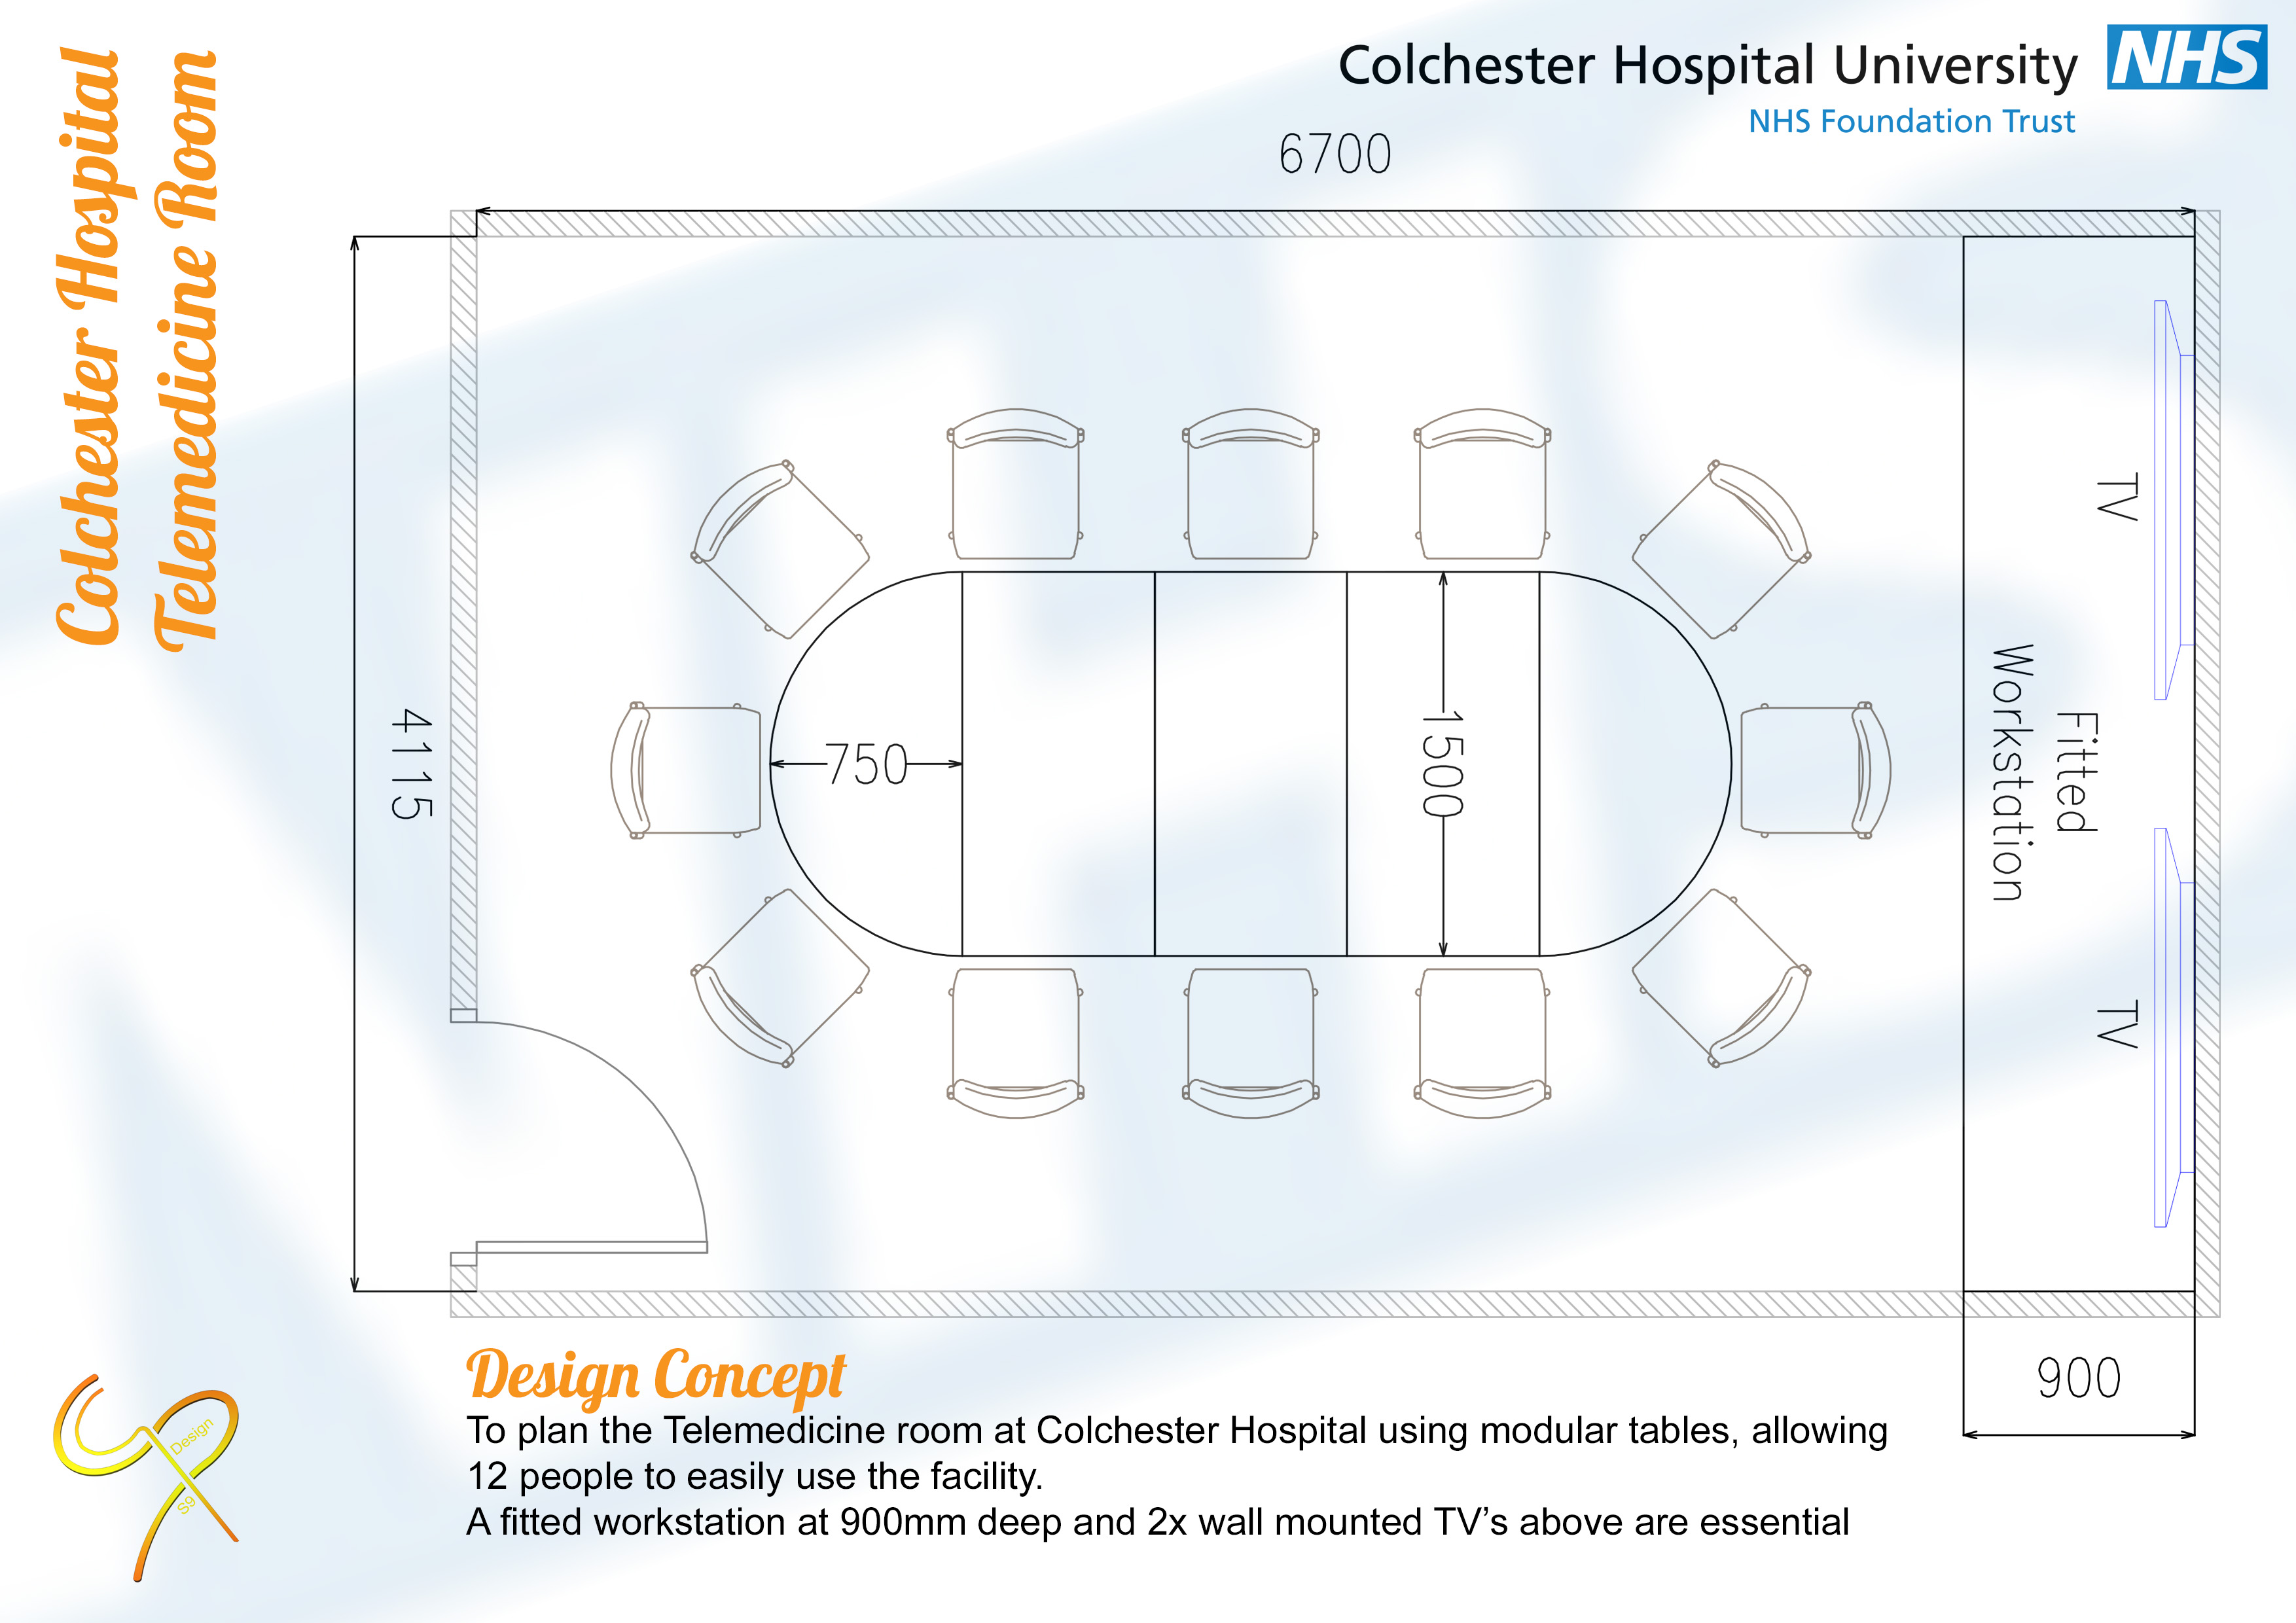 Colchester Hospital - Telemedicine Room